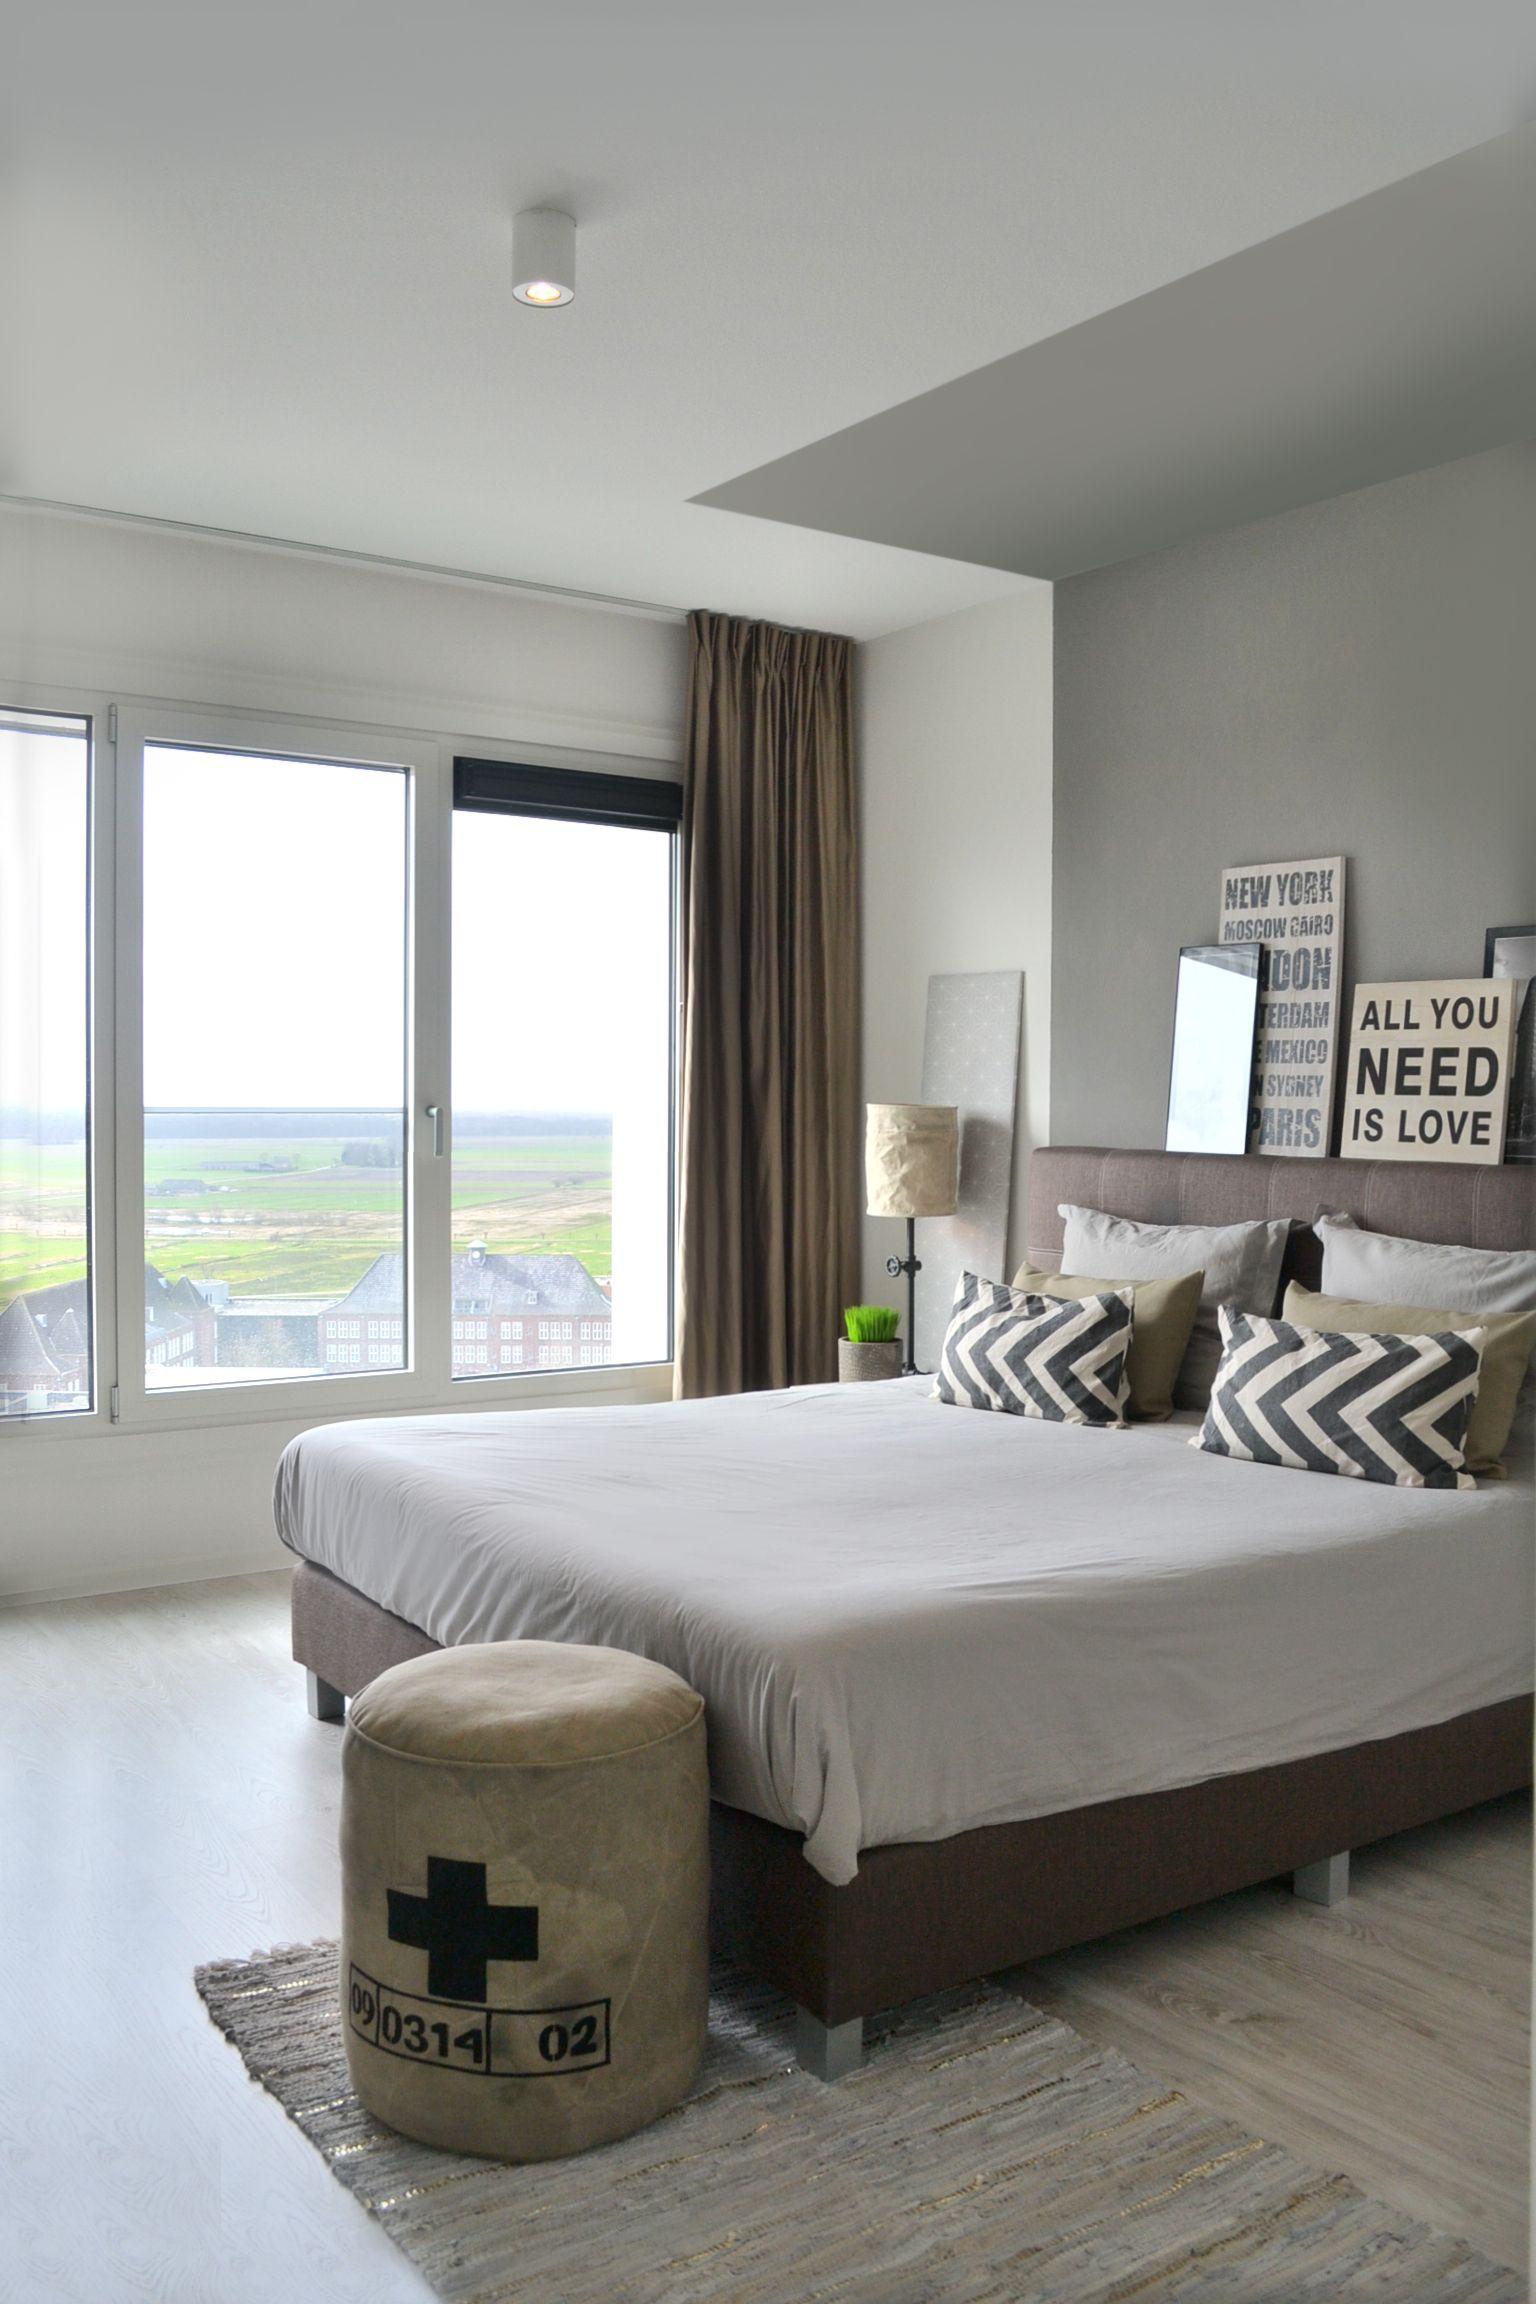 slaapkamer design forever home retro kussens grijstinten gerecycled ...